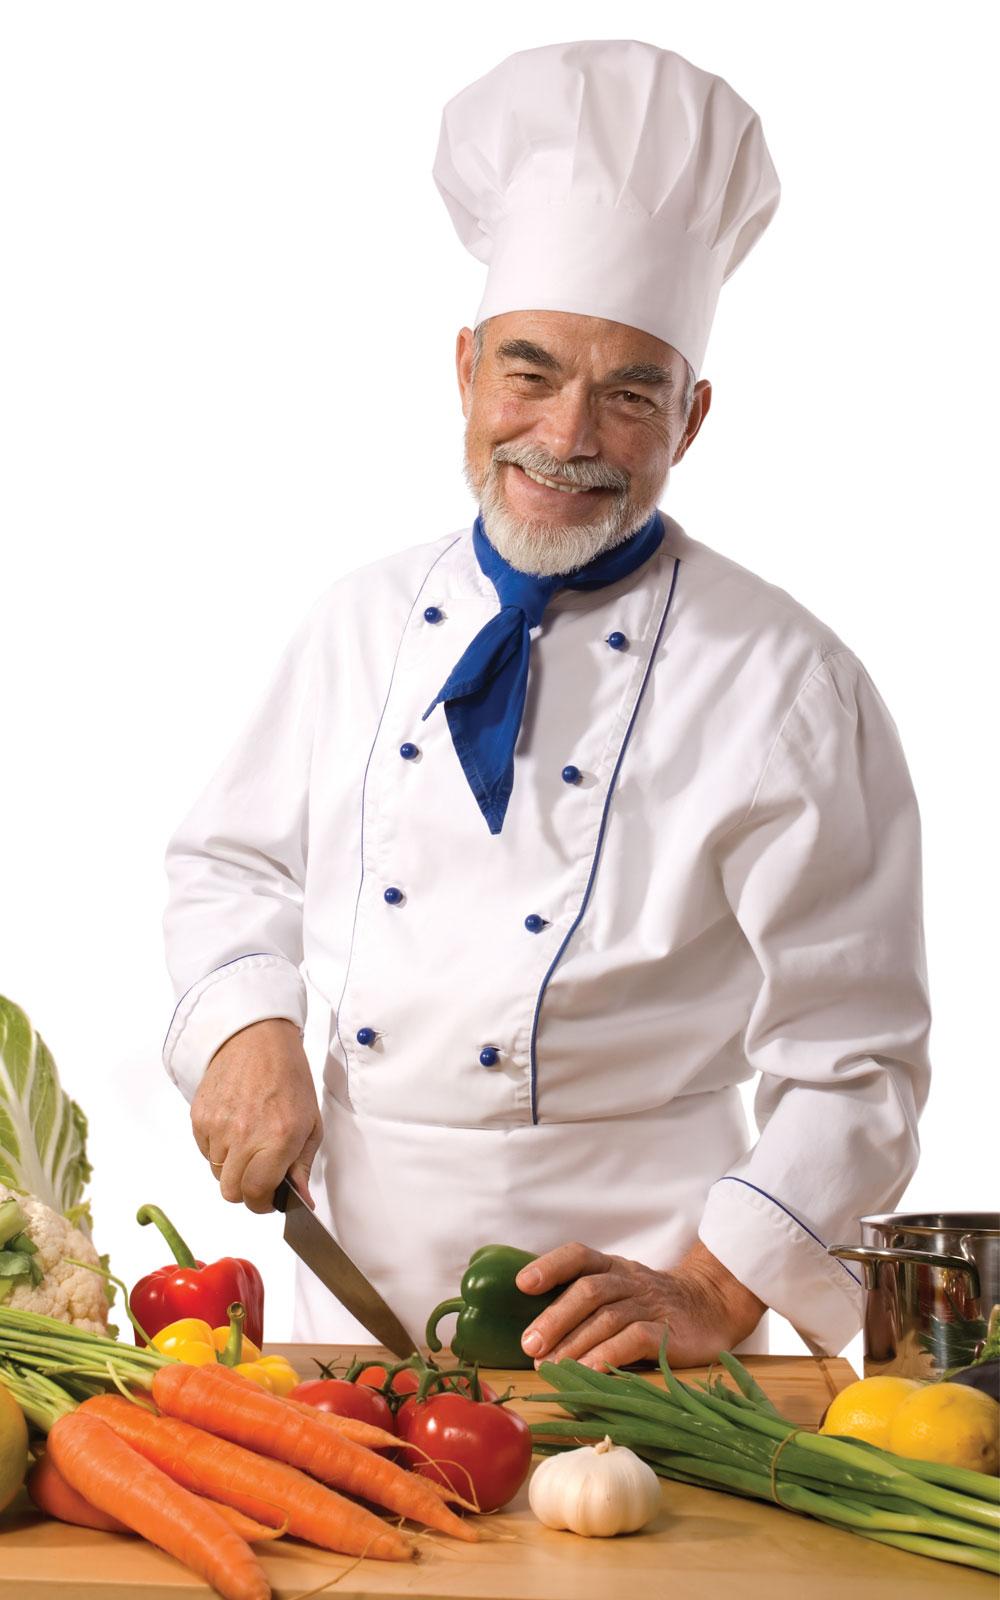 Executive-Chef-Jacket-4